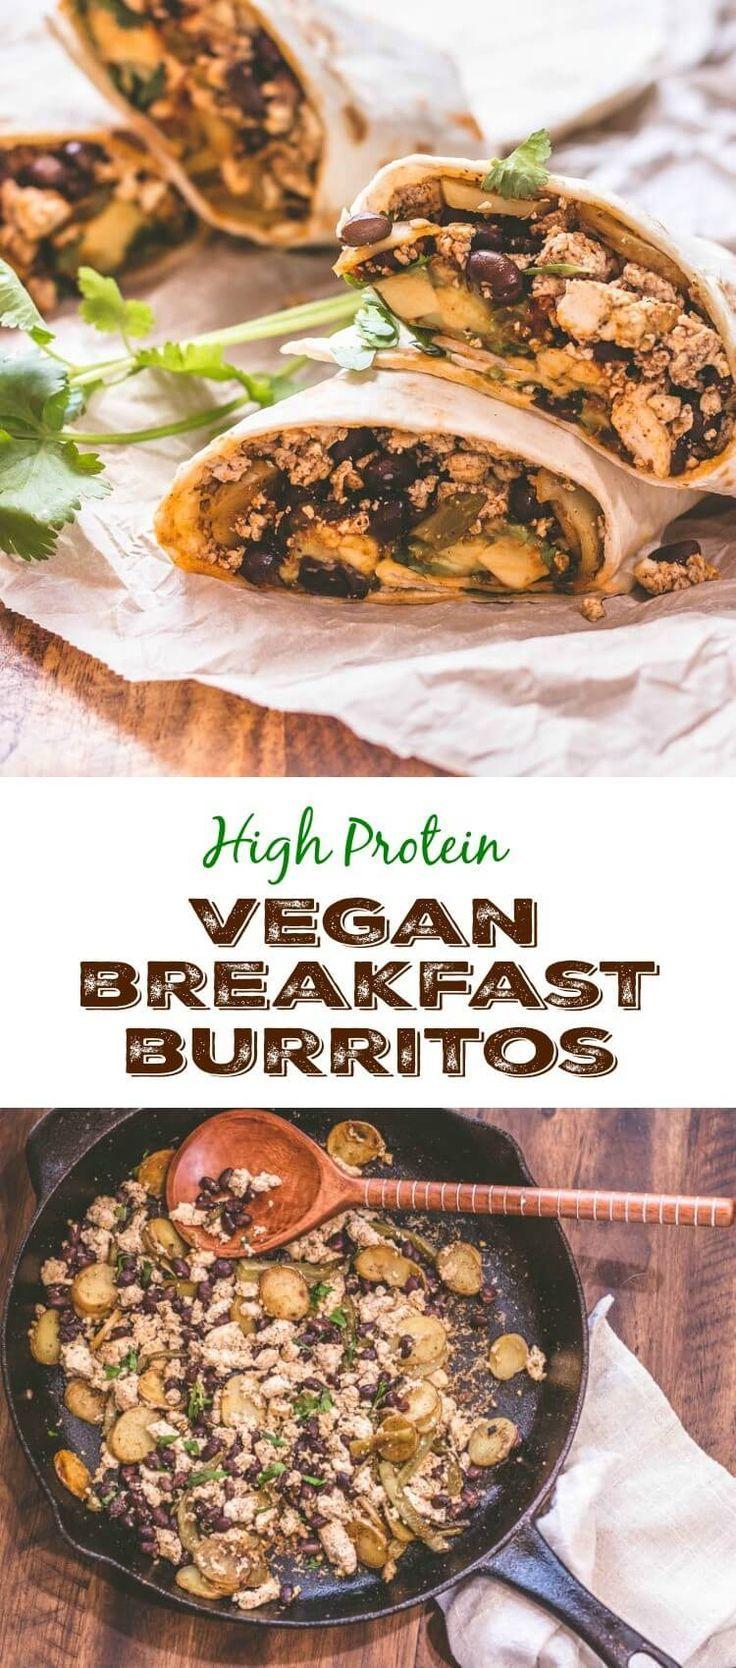 High Protein Vegan Breakfast Burritos